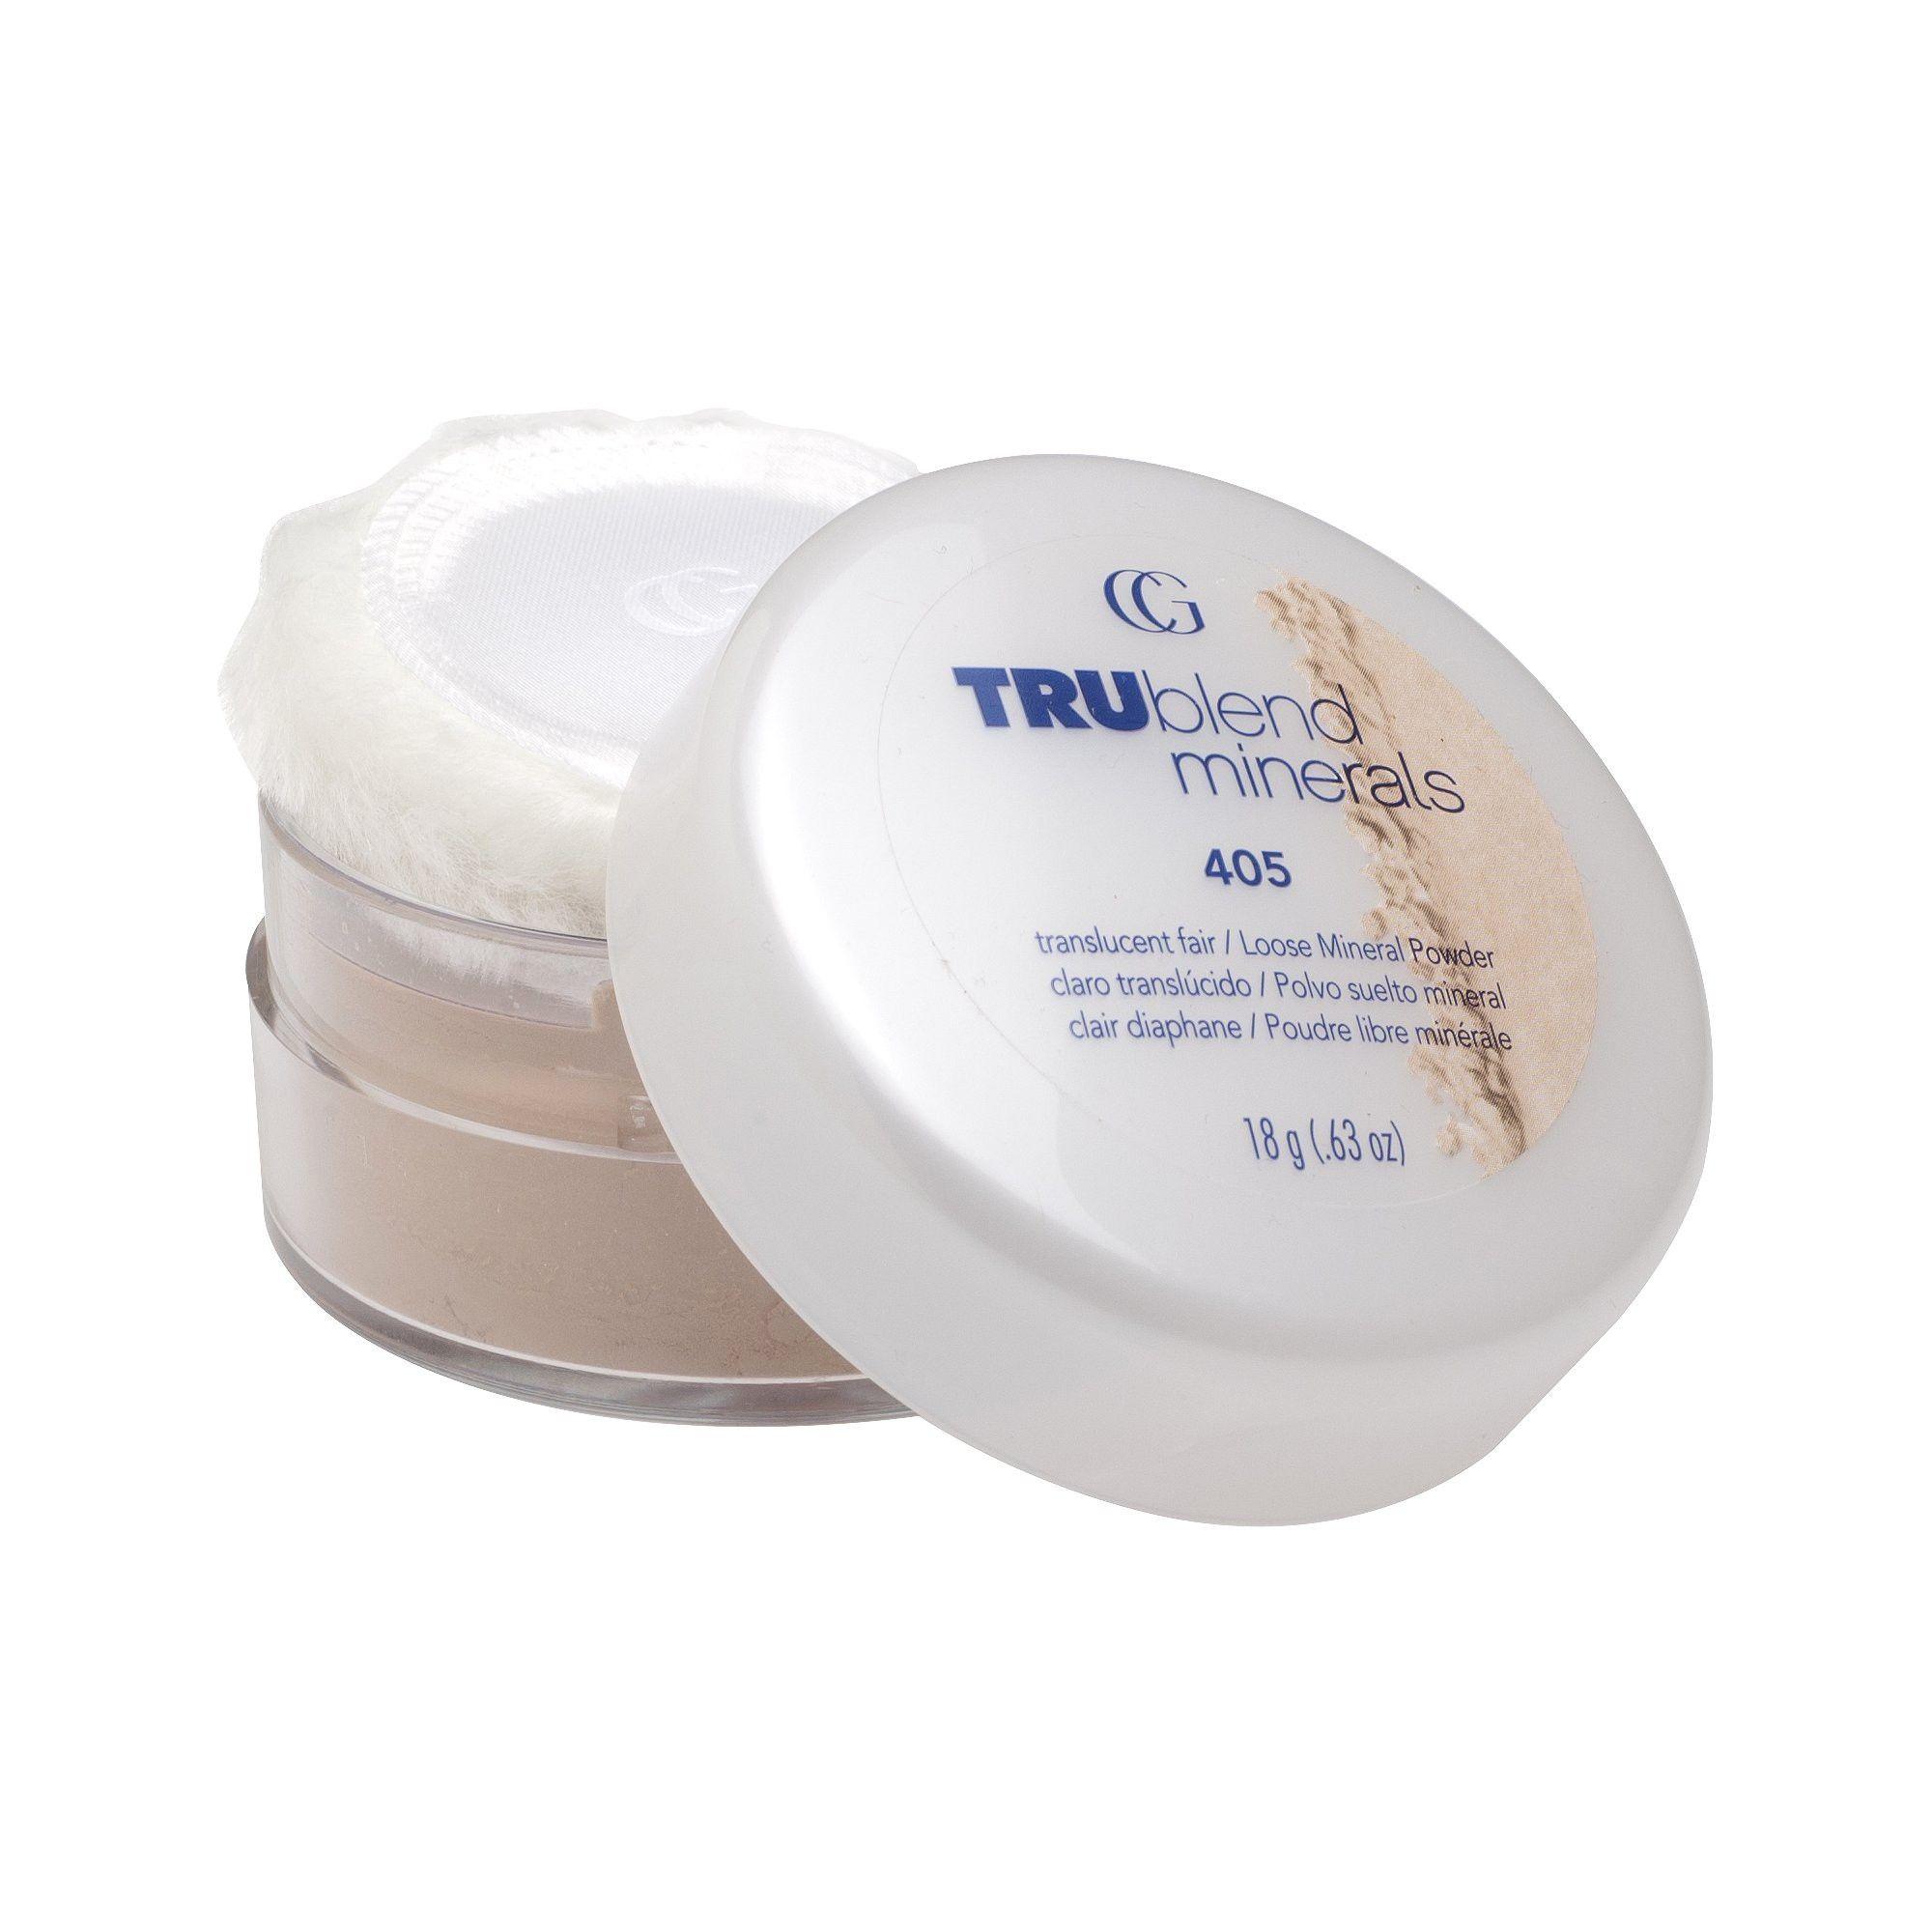 Covergirl truBLEND Loose Powder 405 Translucent Fair .63oz